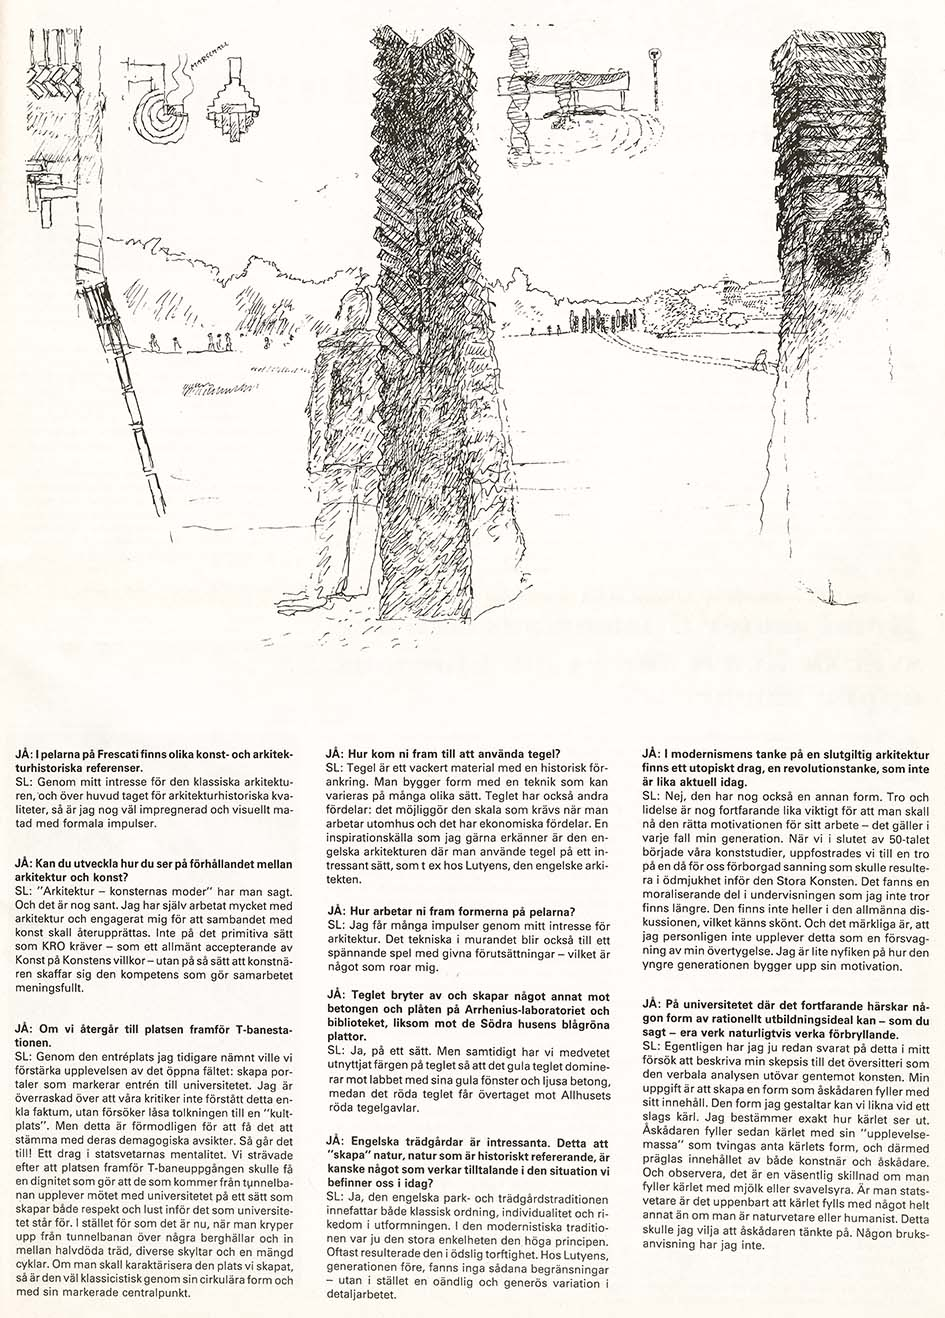 Sivert Lindblom Frescati 2